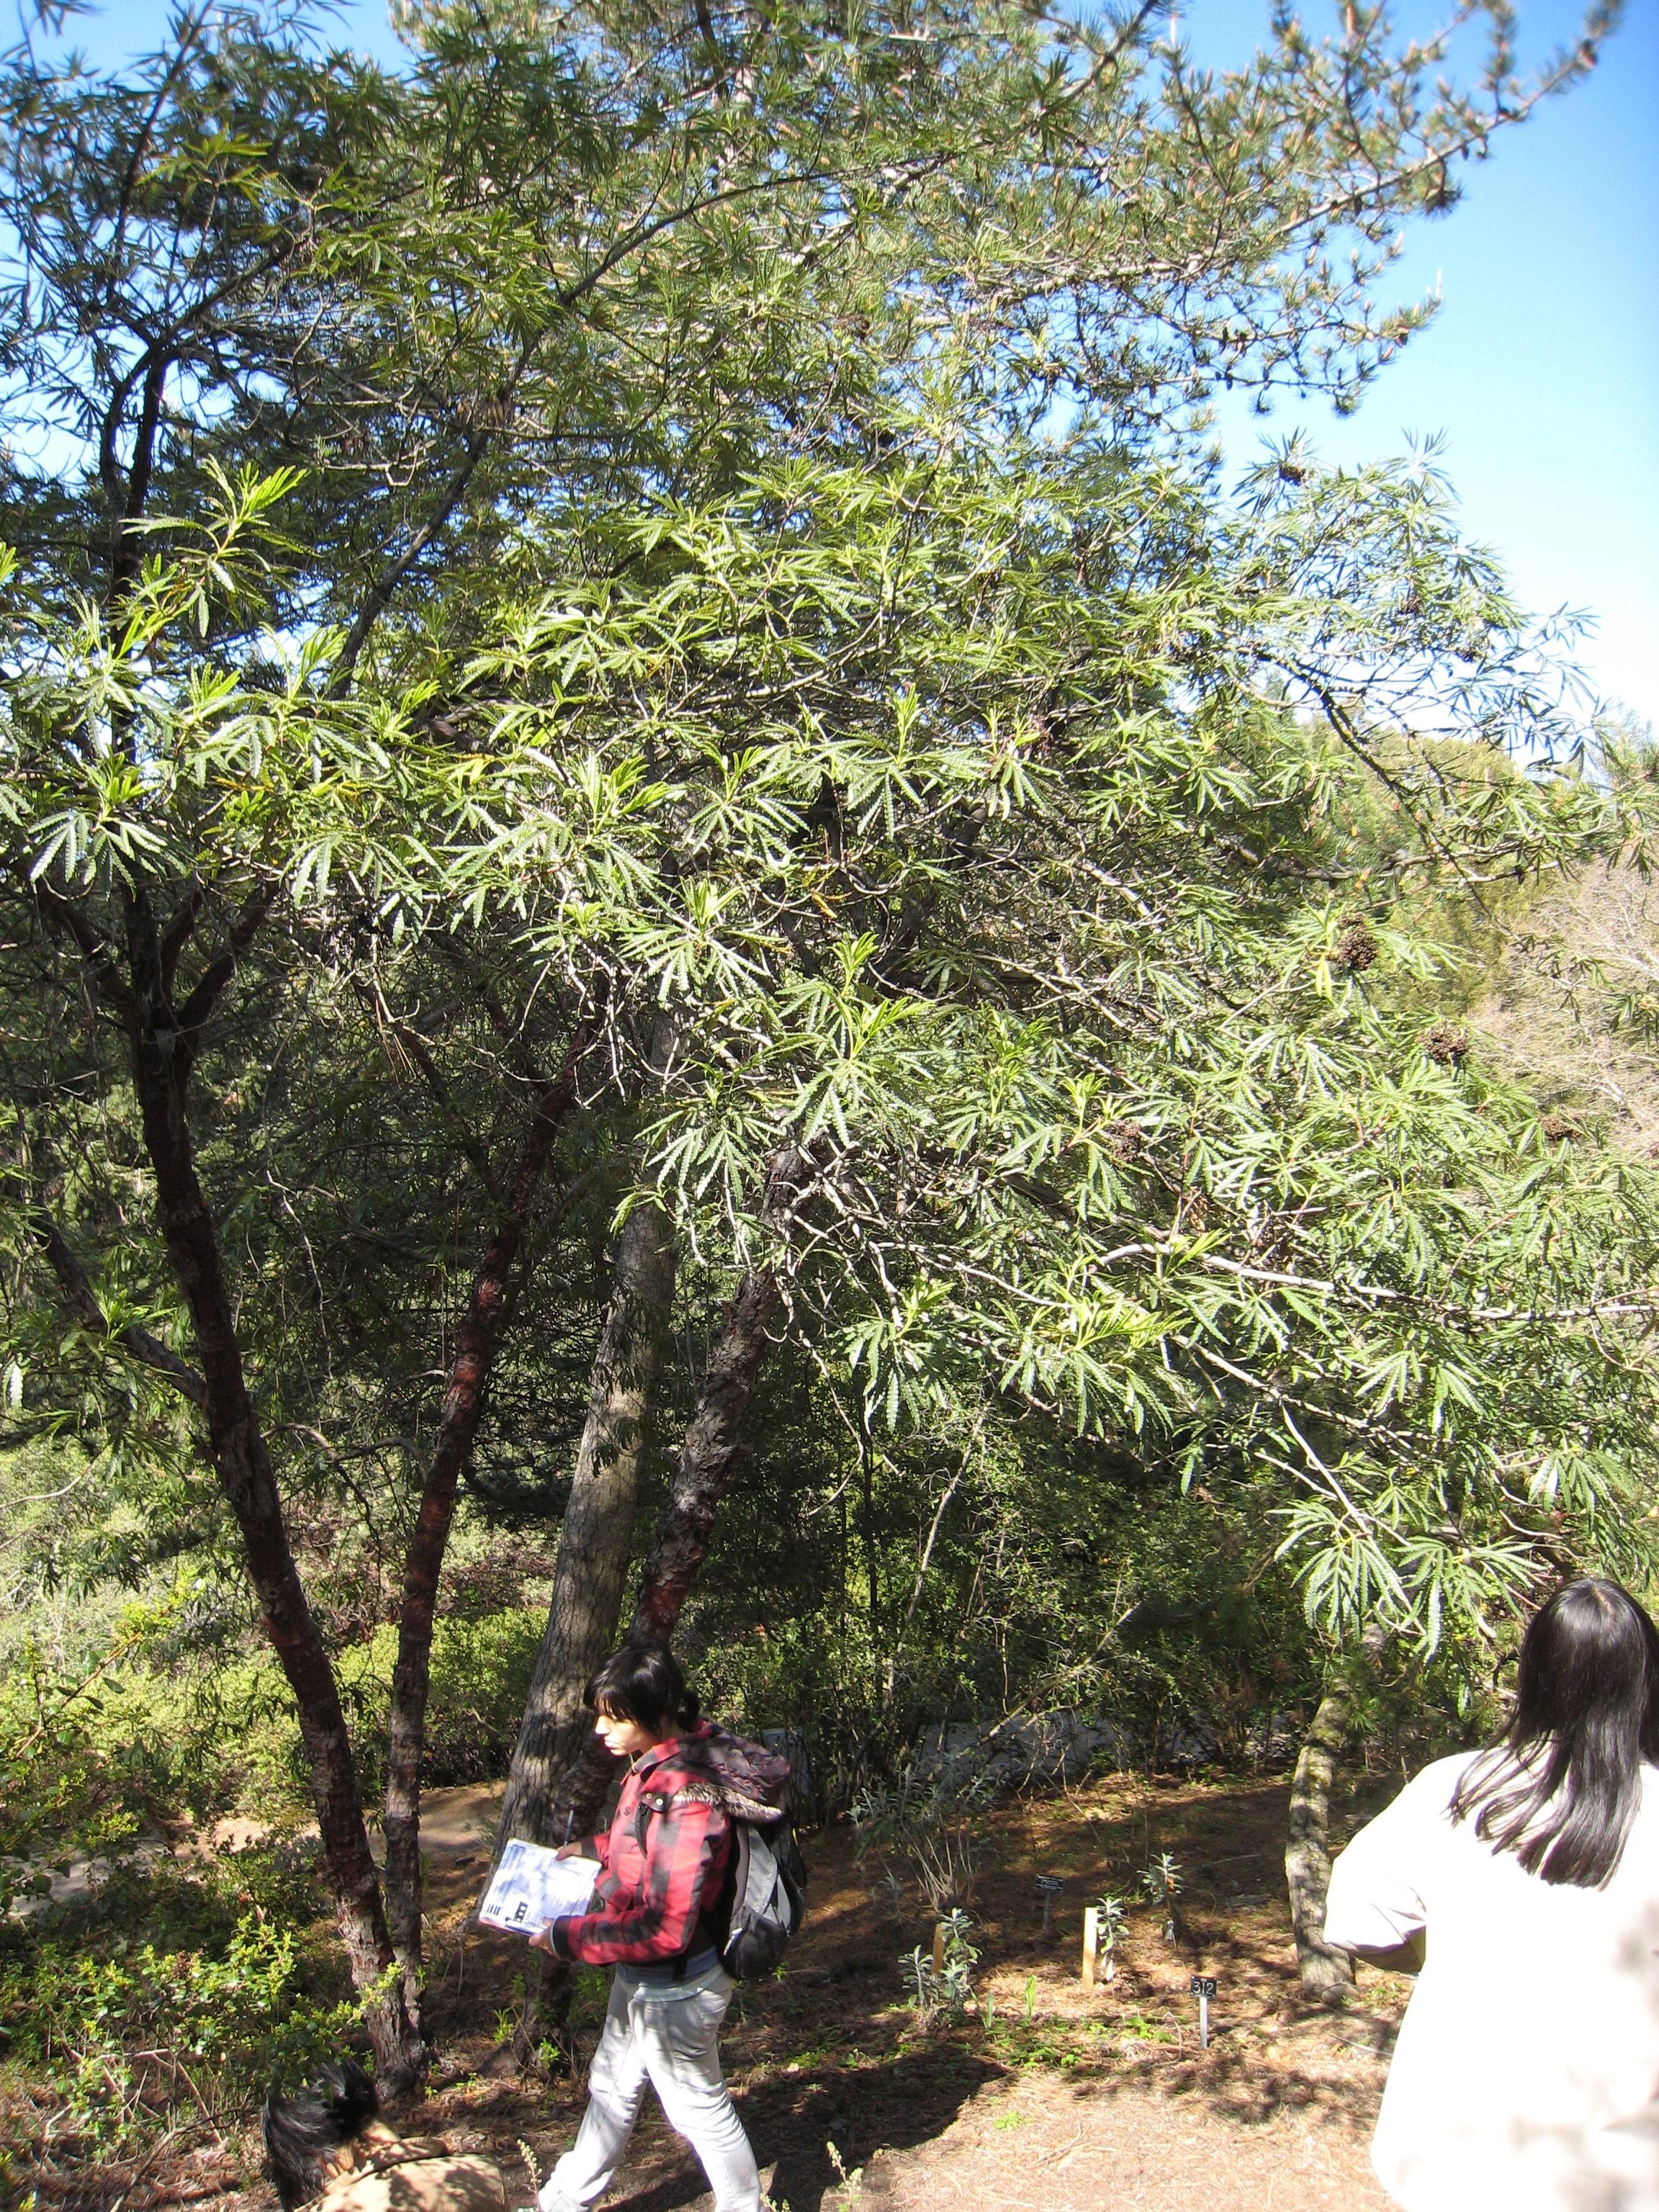 Lyonothamnus floribundus ssp asplenifolius